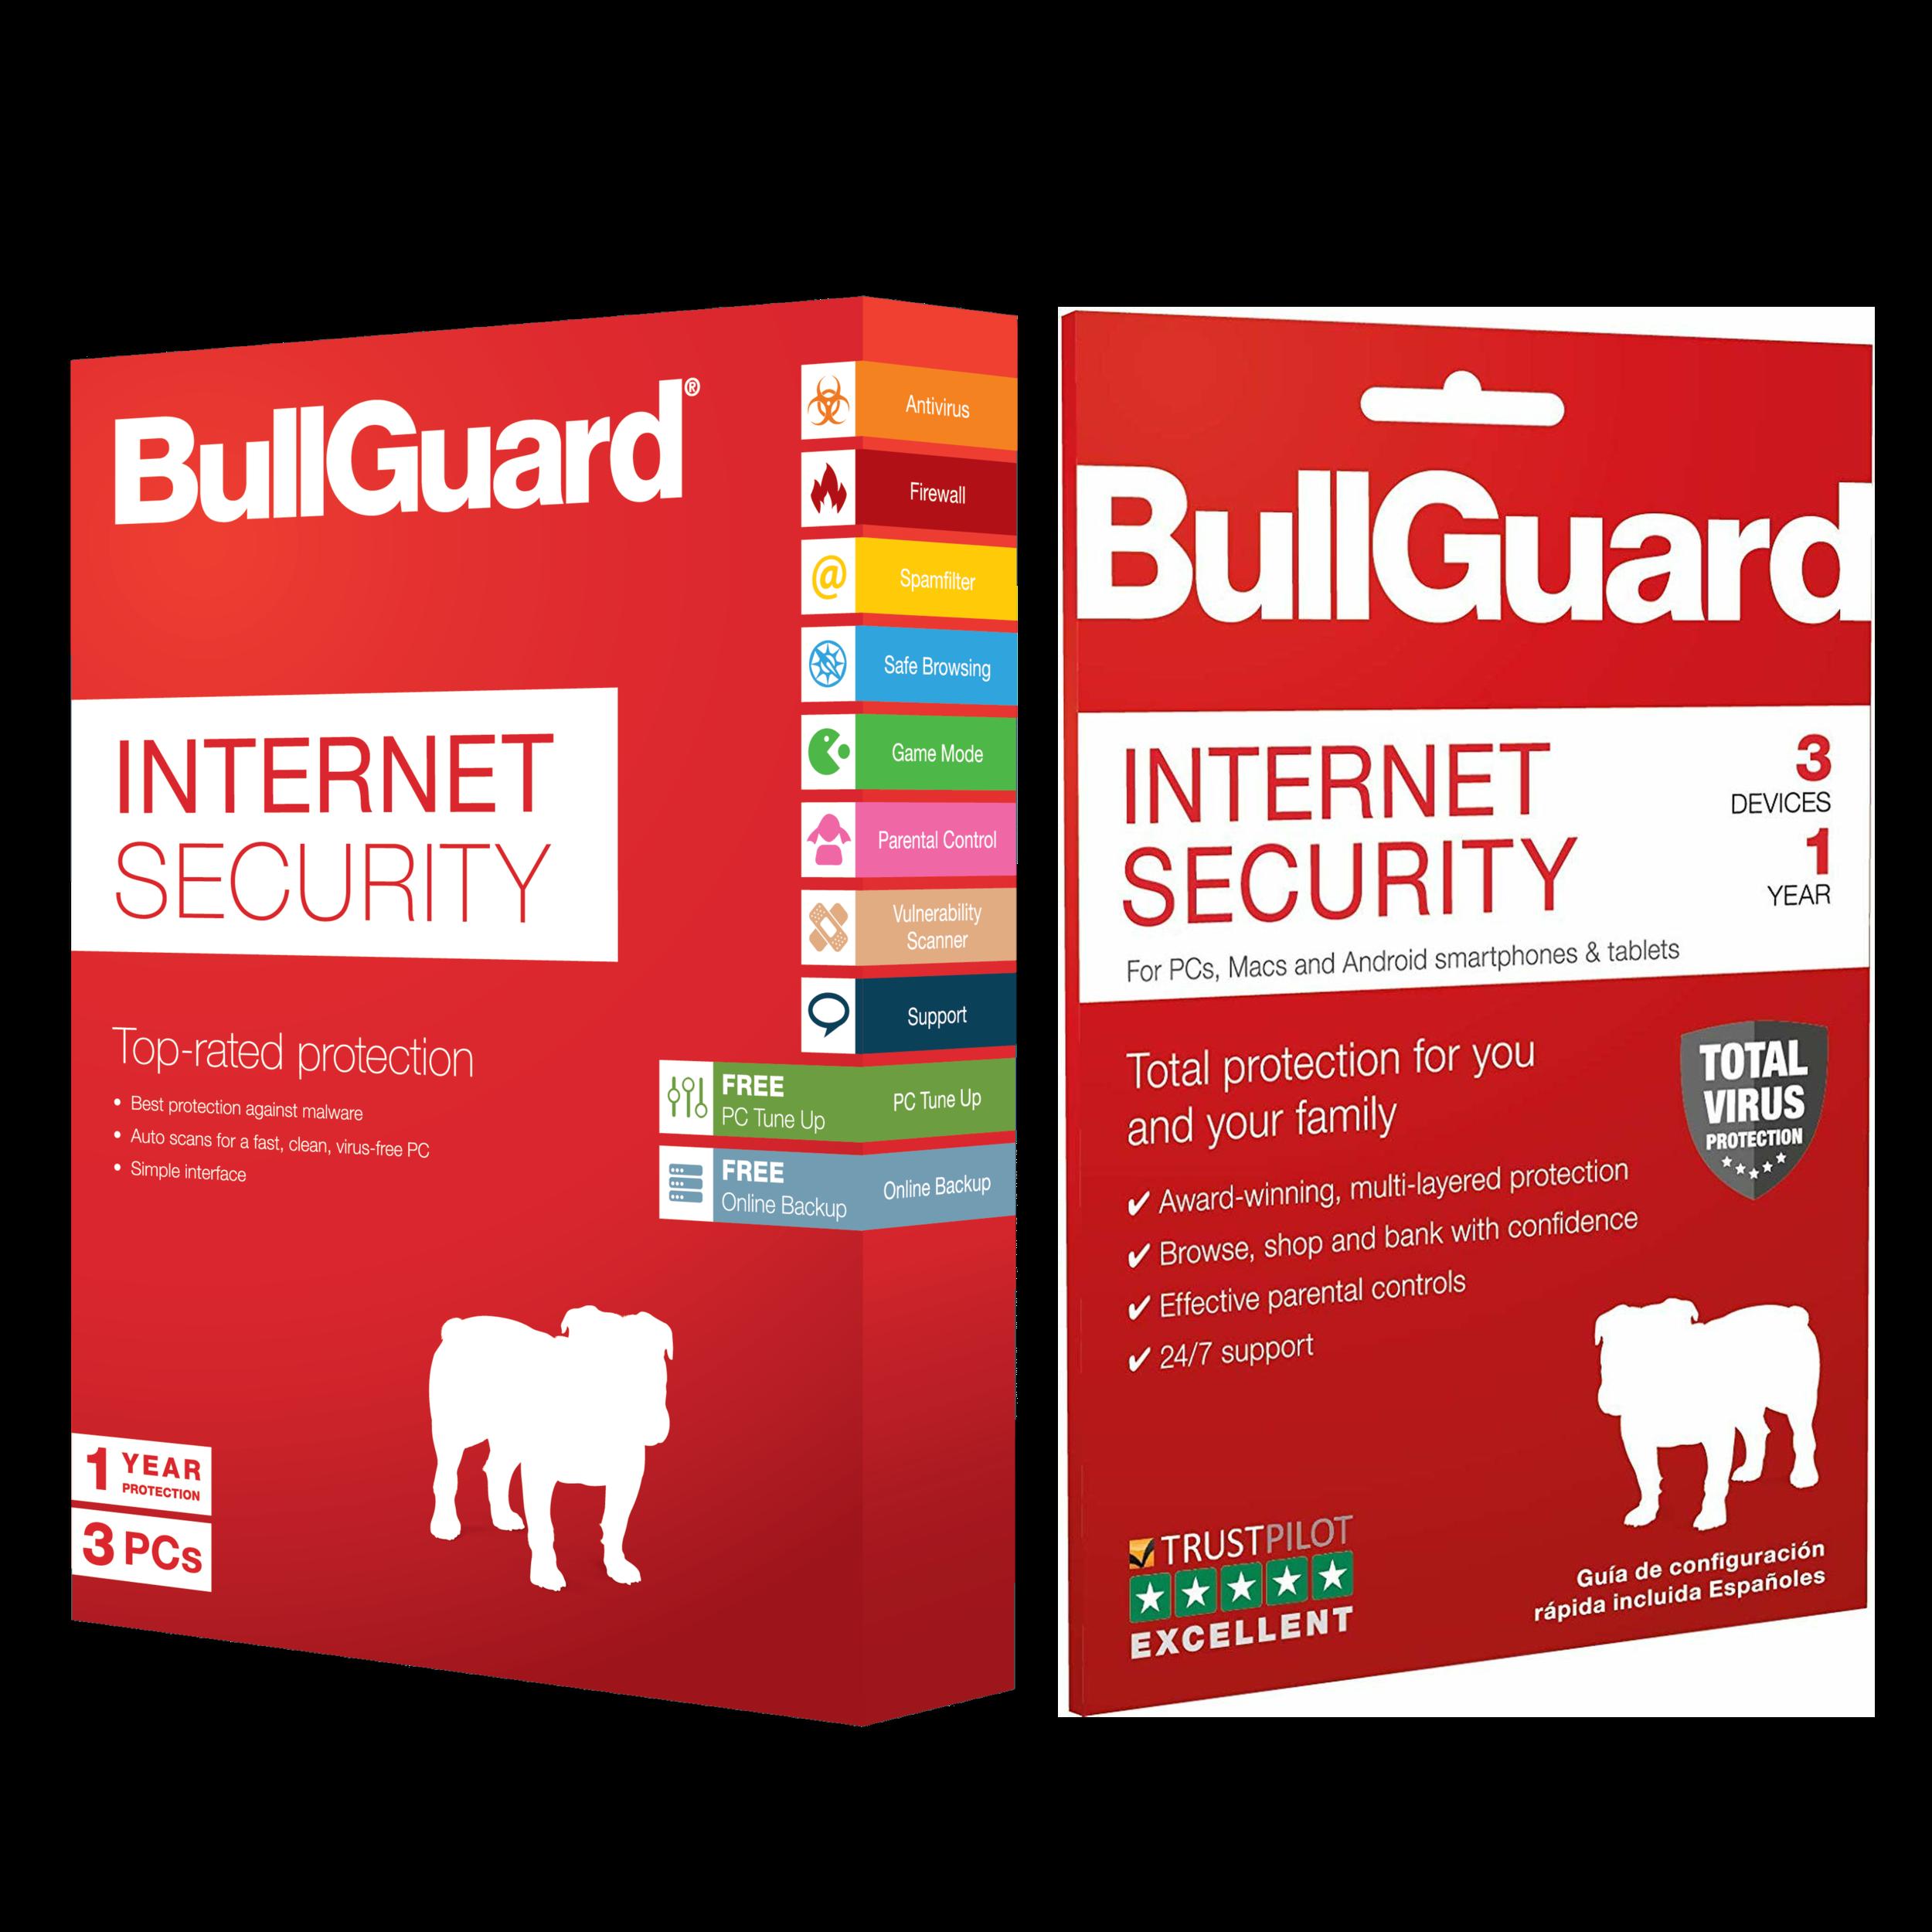 Bullguard Back to back.png